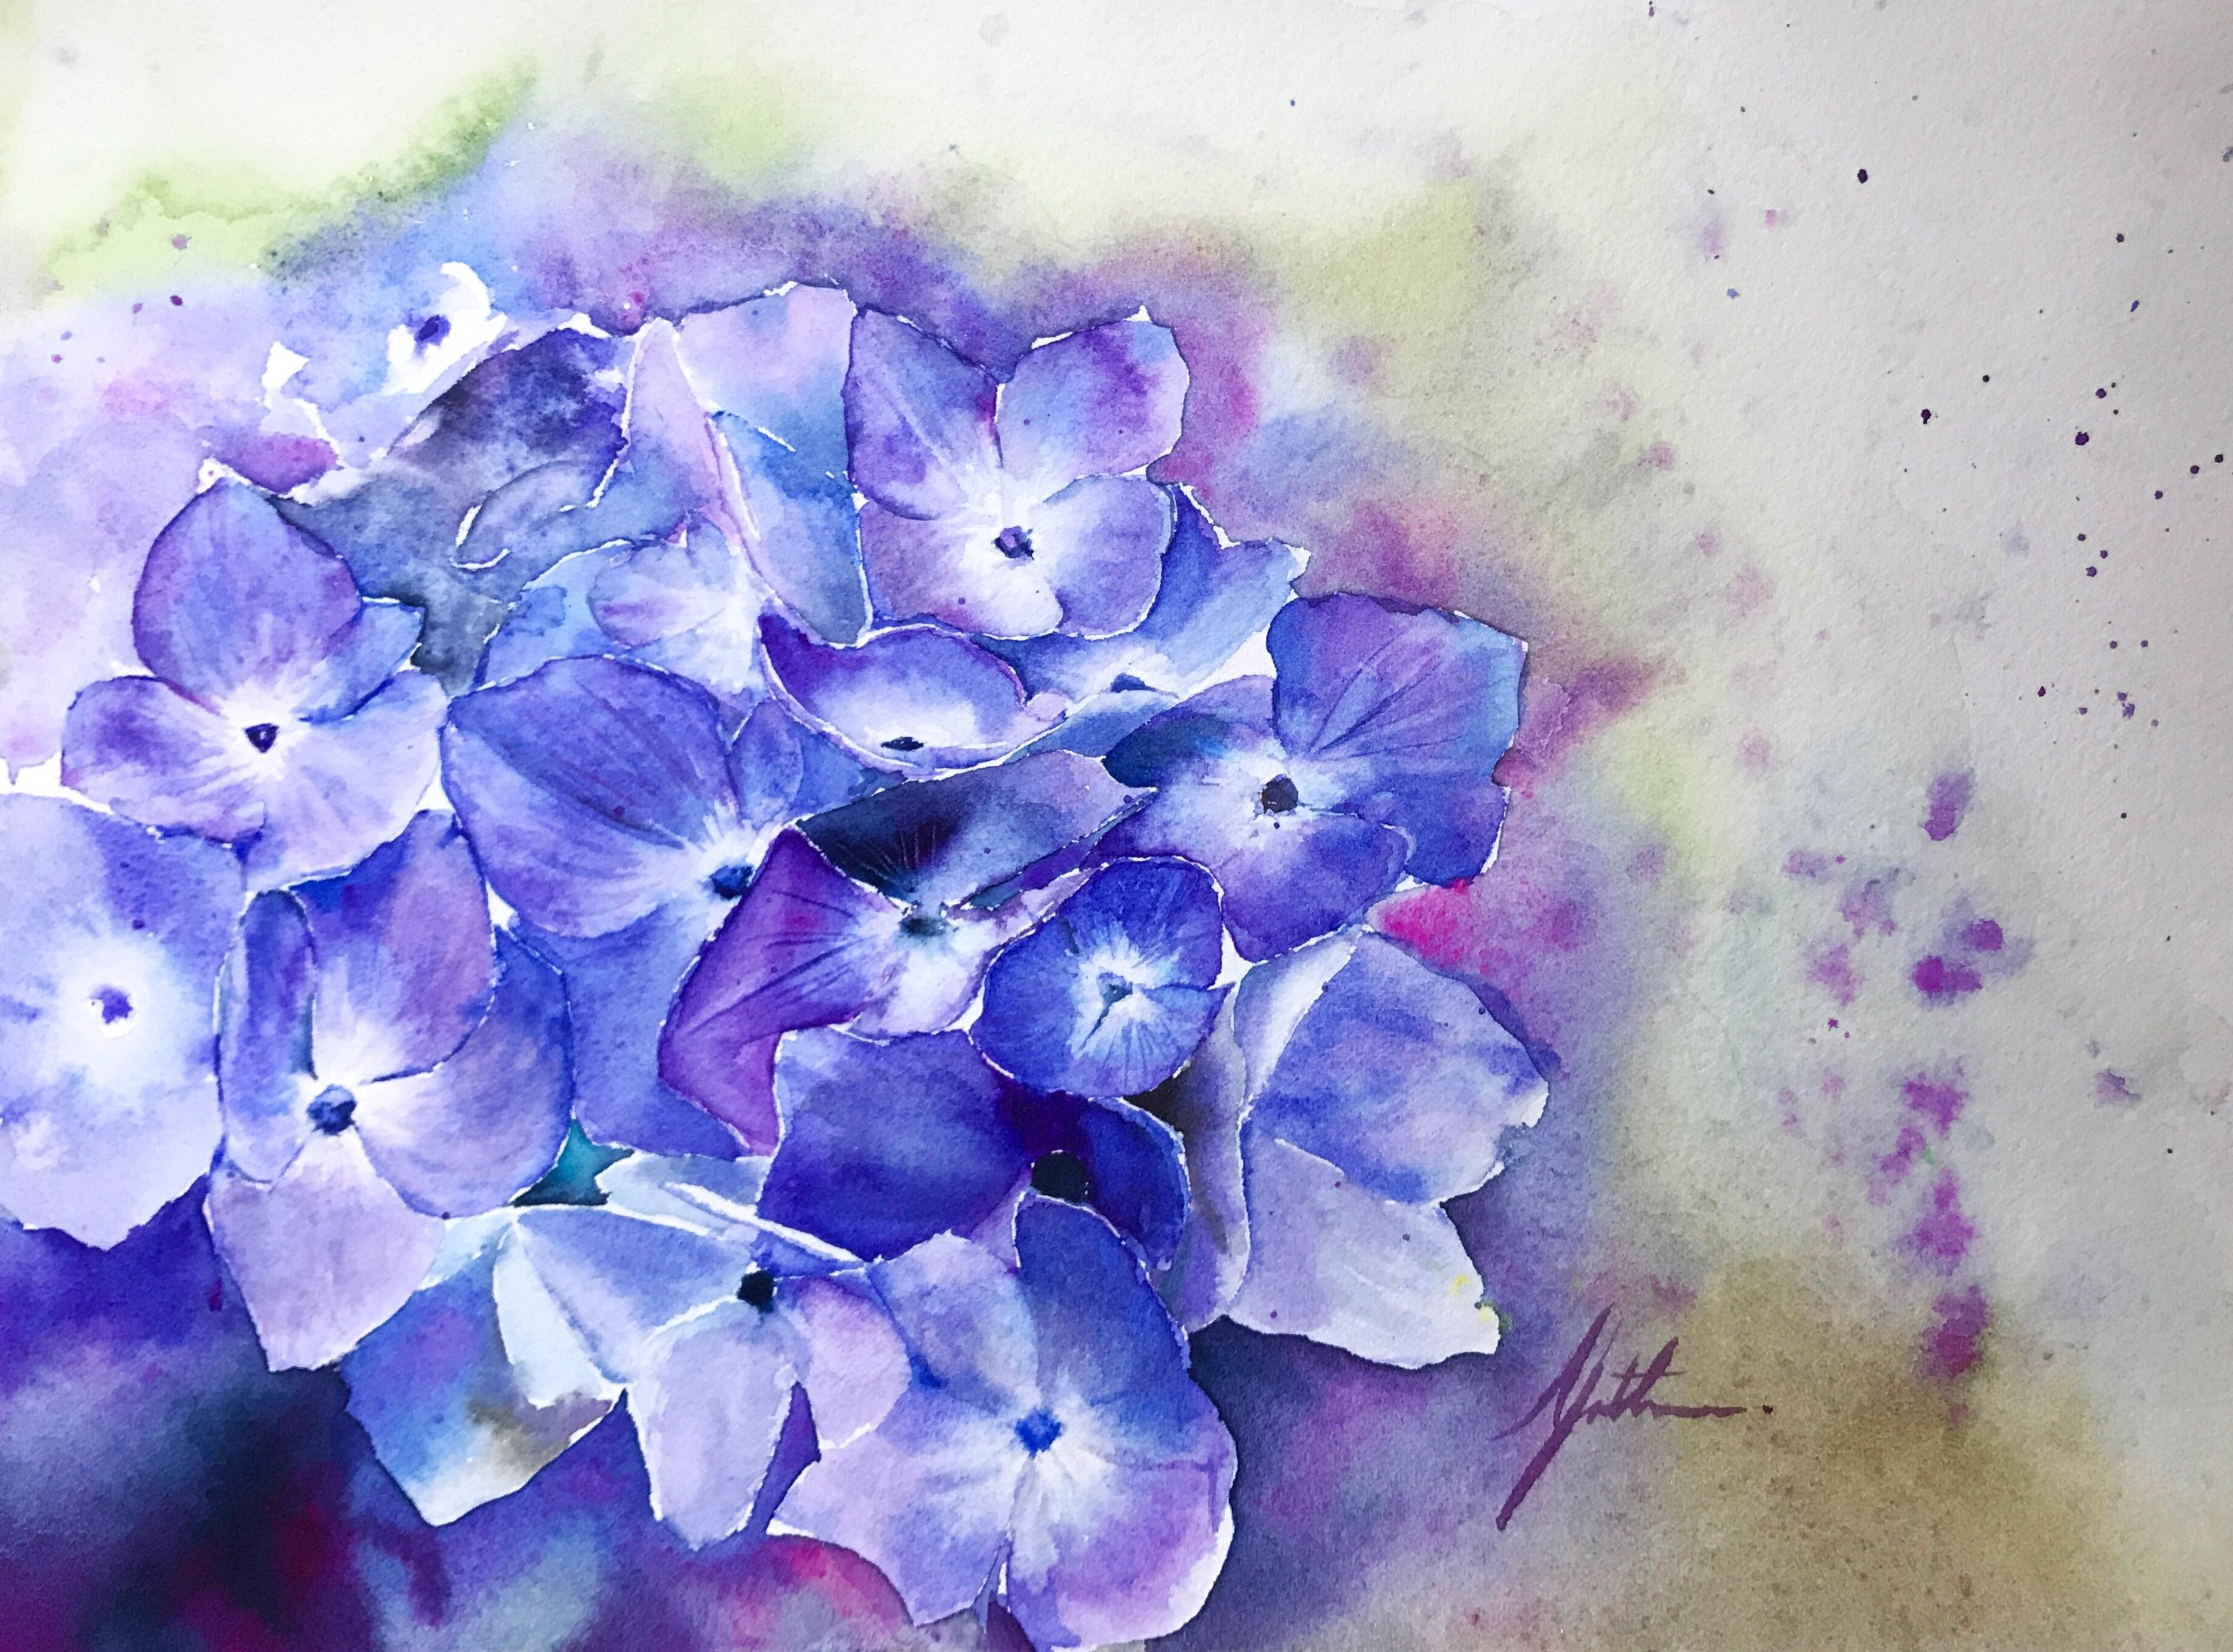 Murmur of Hydrangea -- The Violet